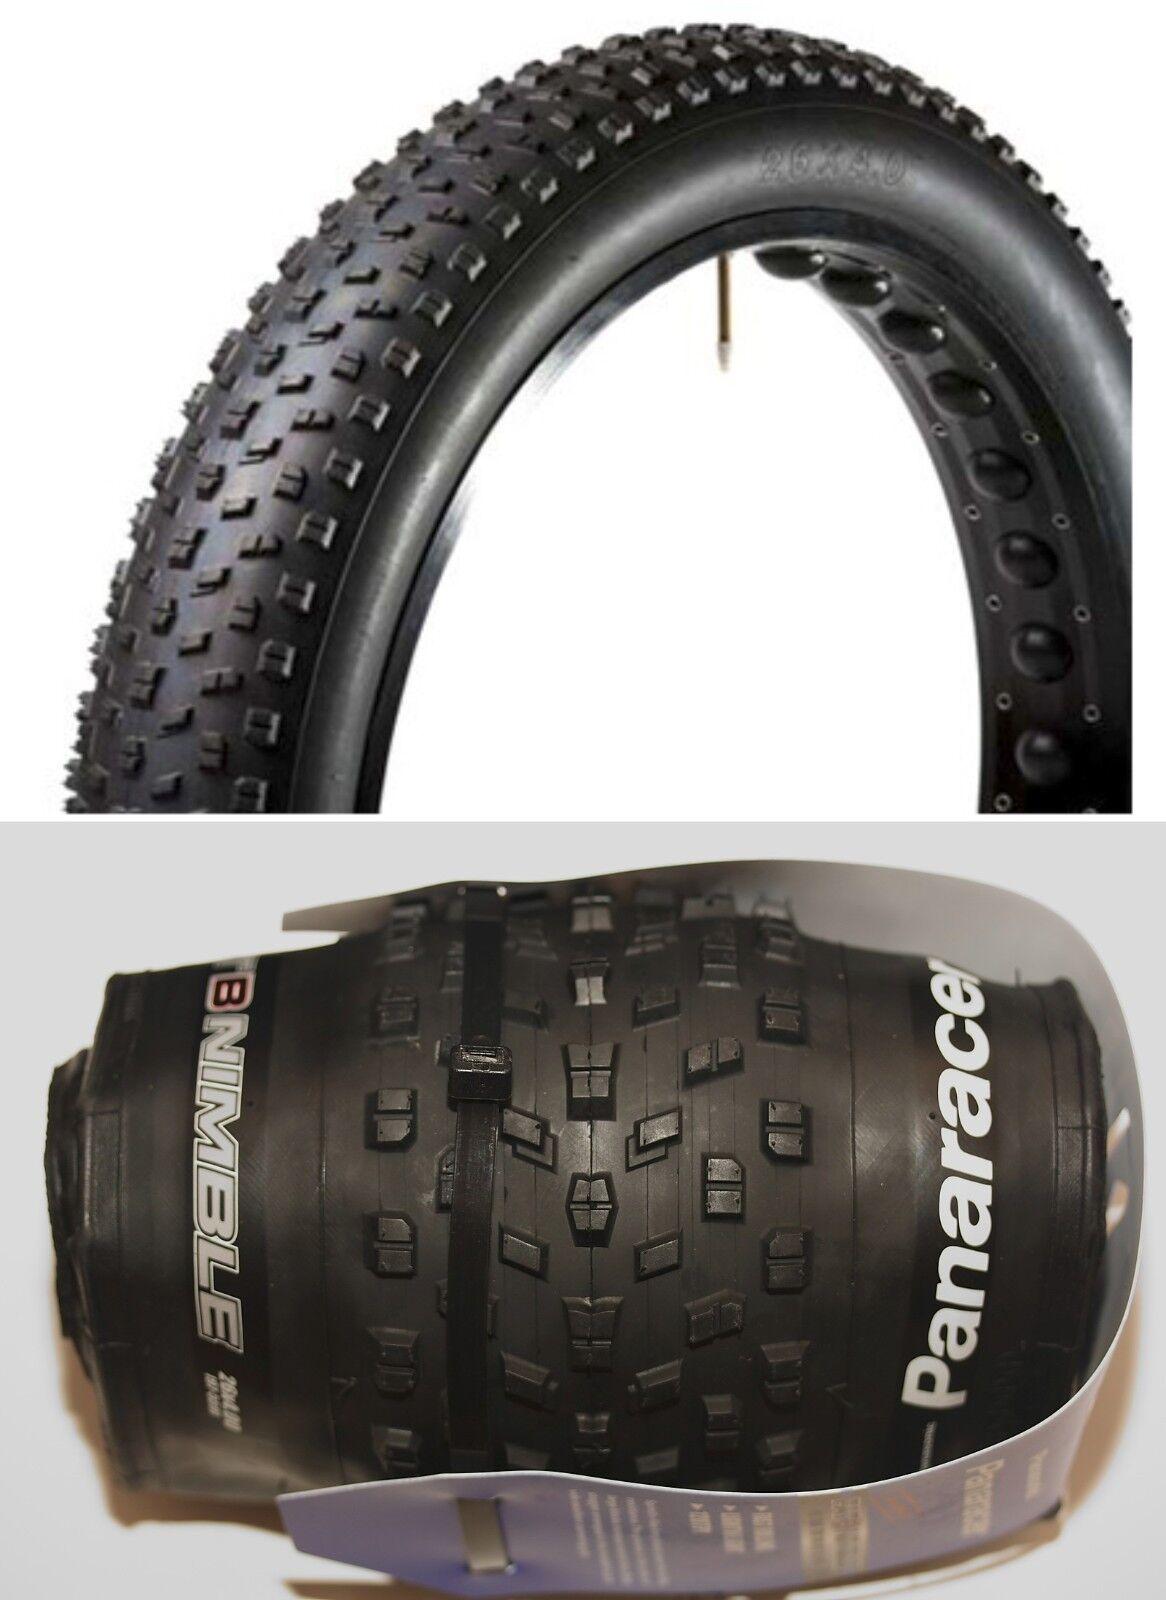 4,0   Panaracer Fat Nimble Fatbike Tyre 26 Inch